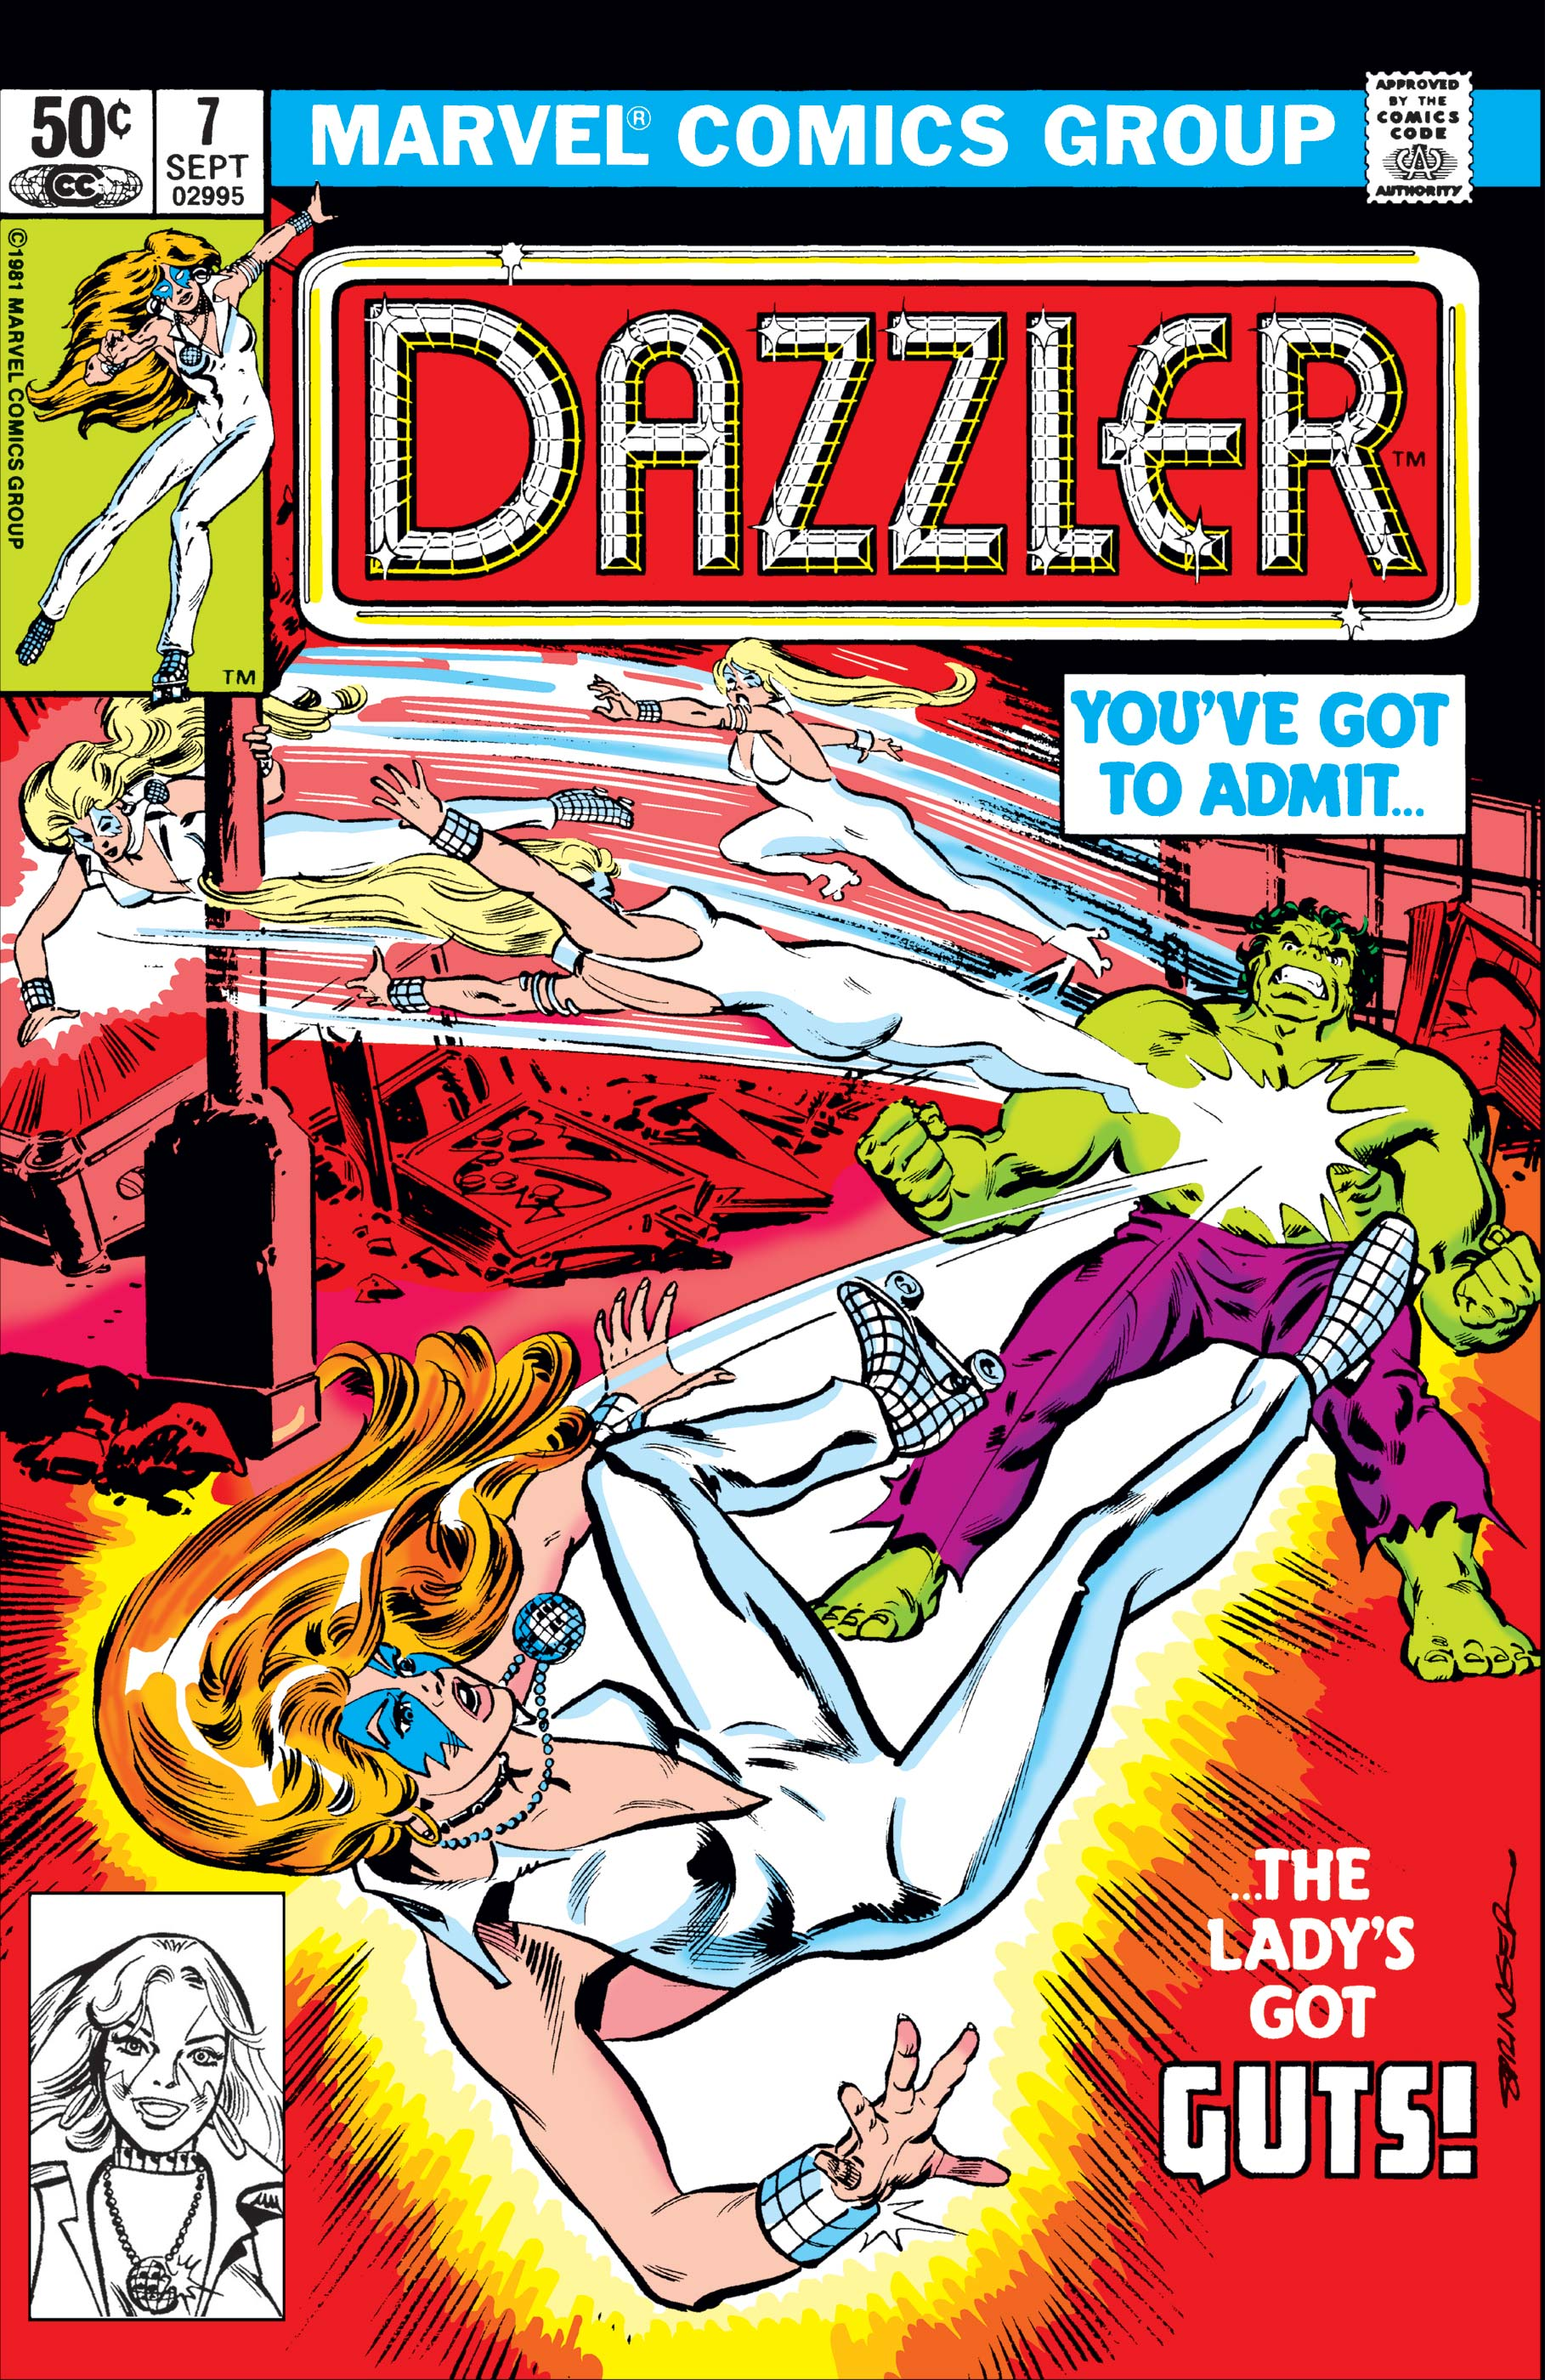 Dazzler (1981) #7